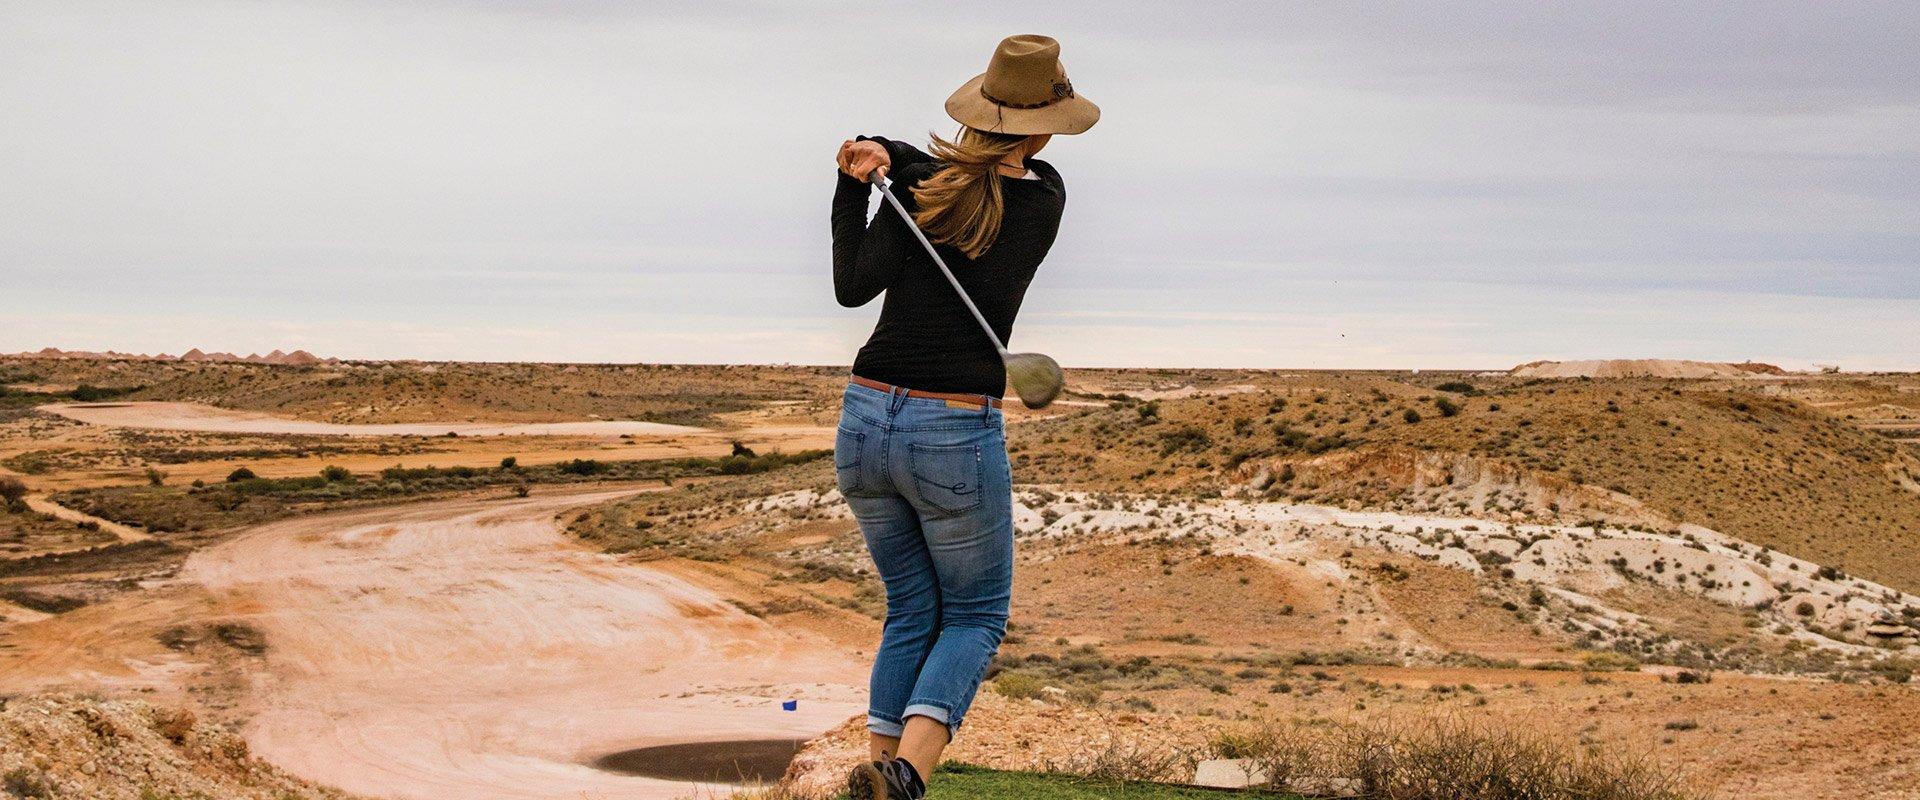 Coober Pedy Opal Fields Golf Club, Outback South Australia